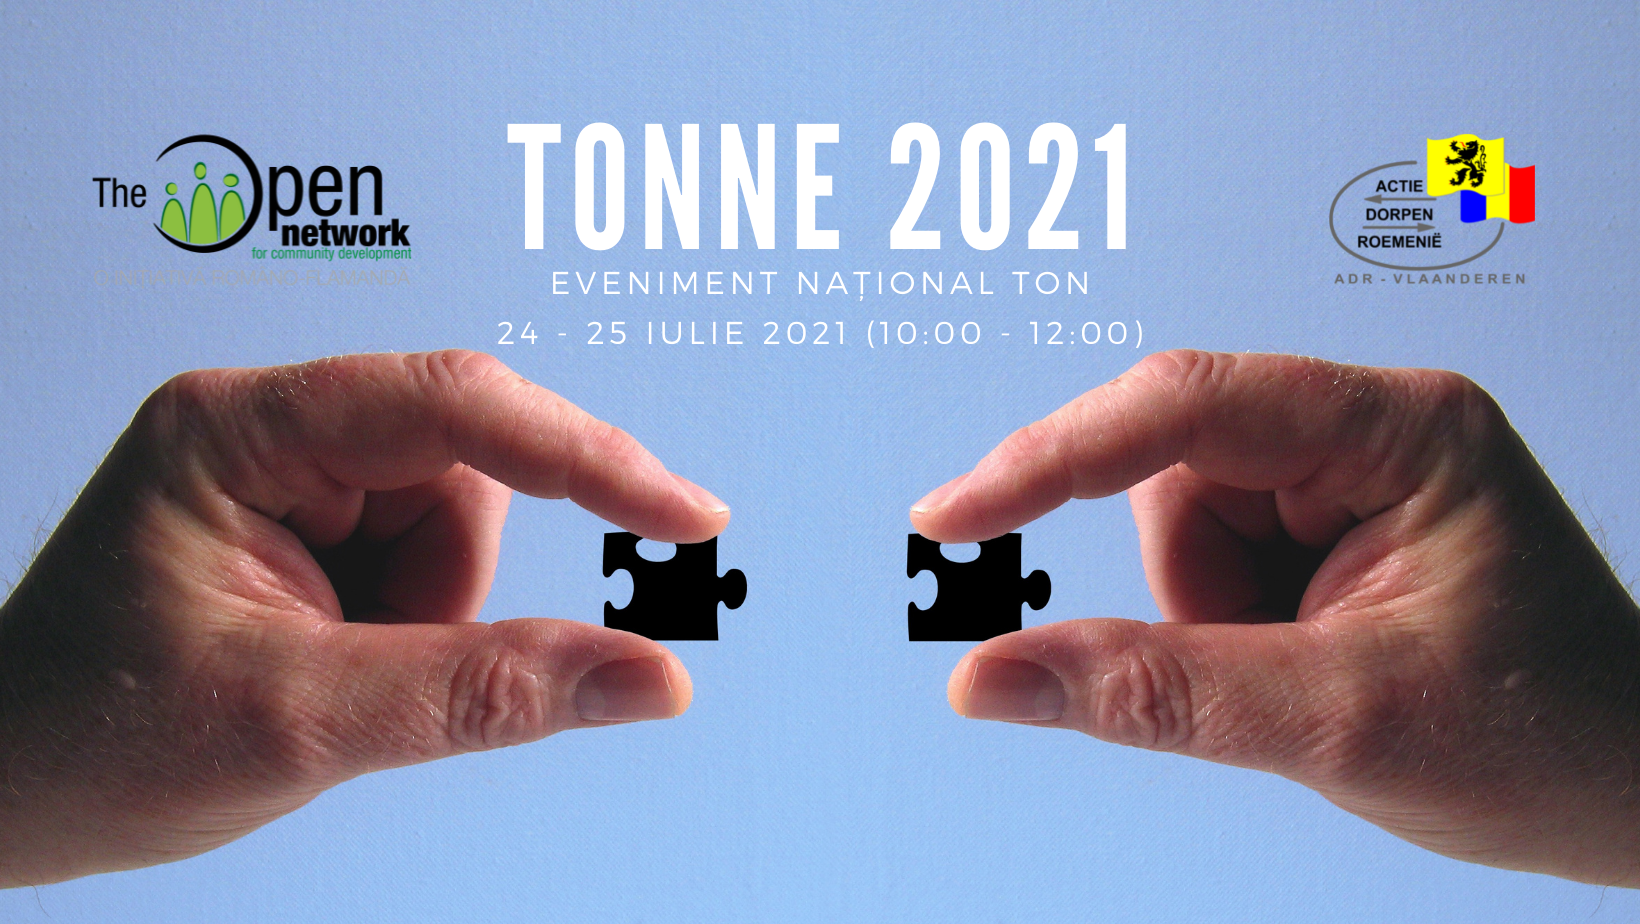 the-open-network-invitatie-TONNE-2021